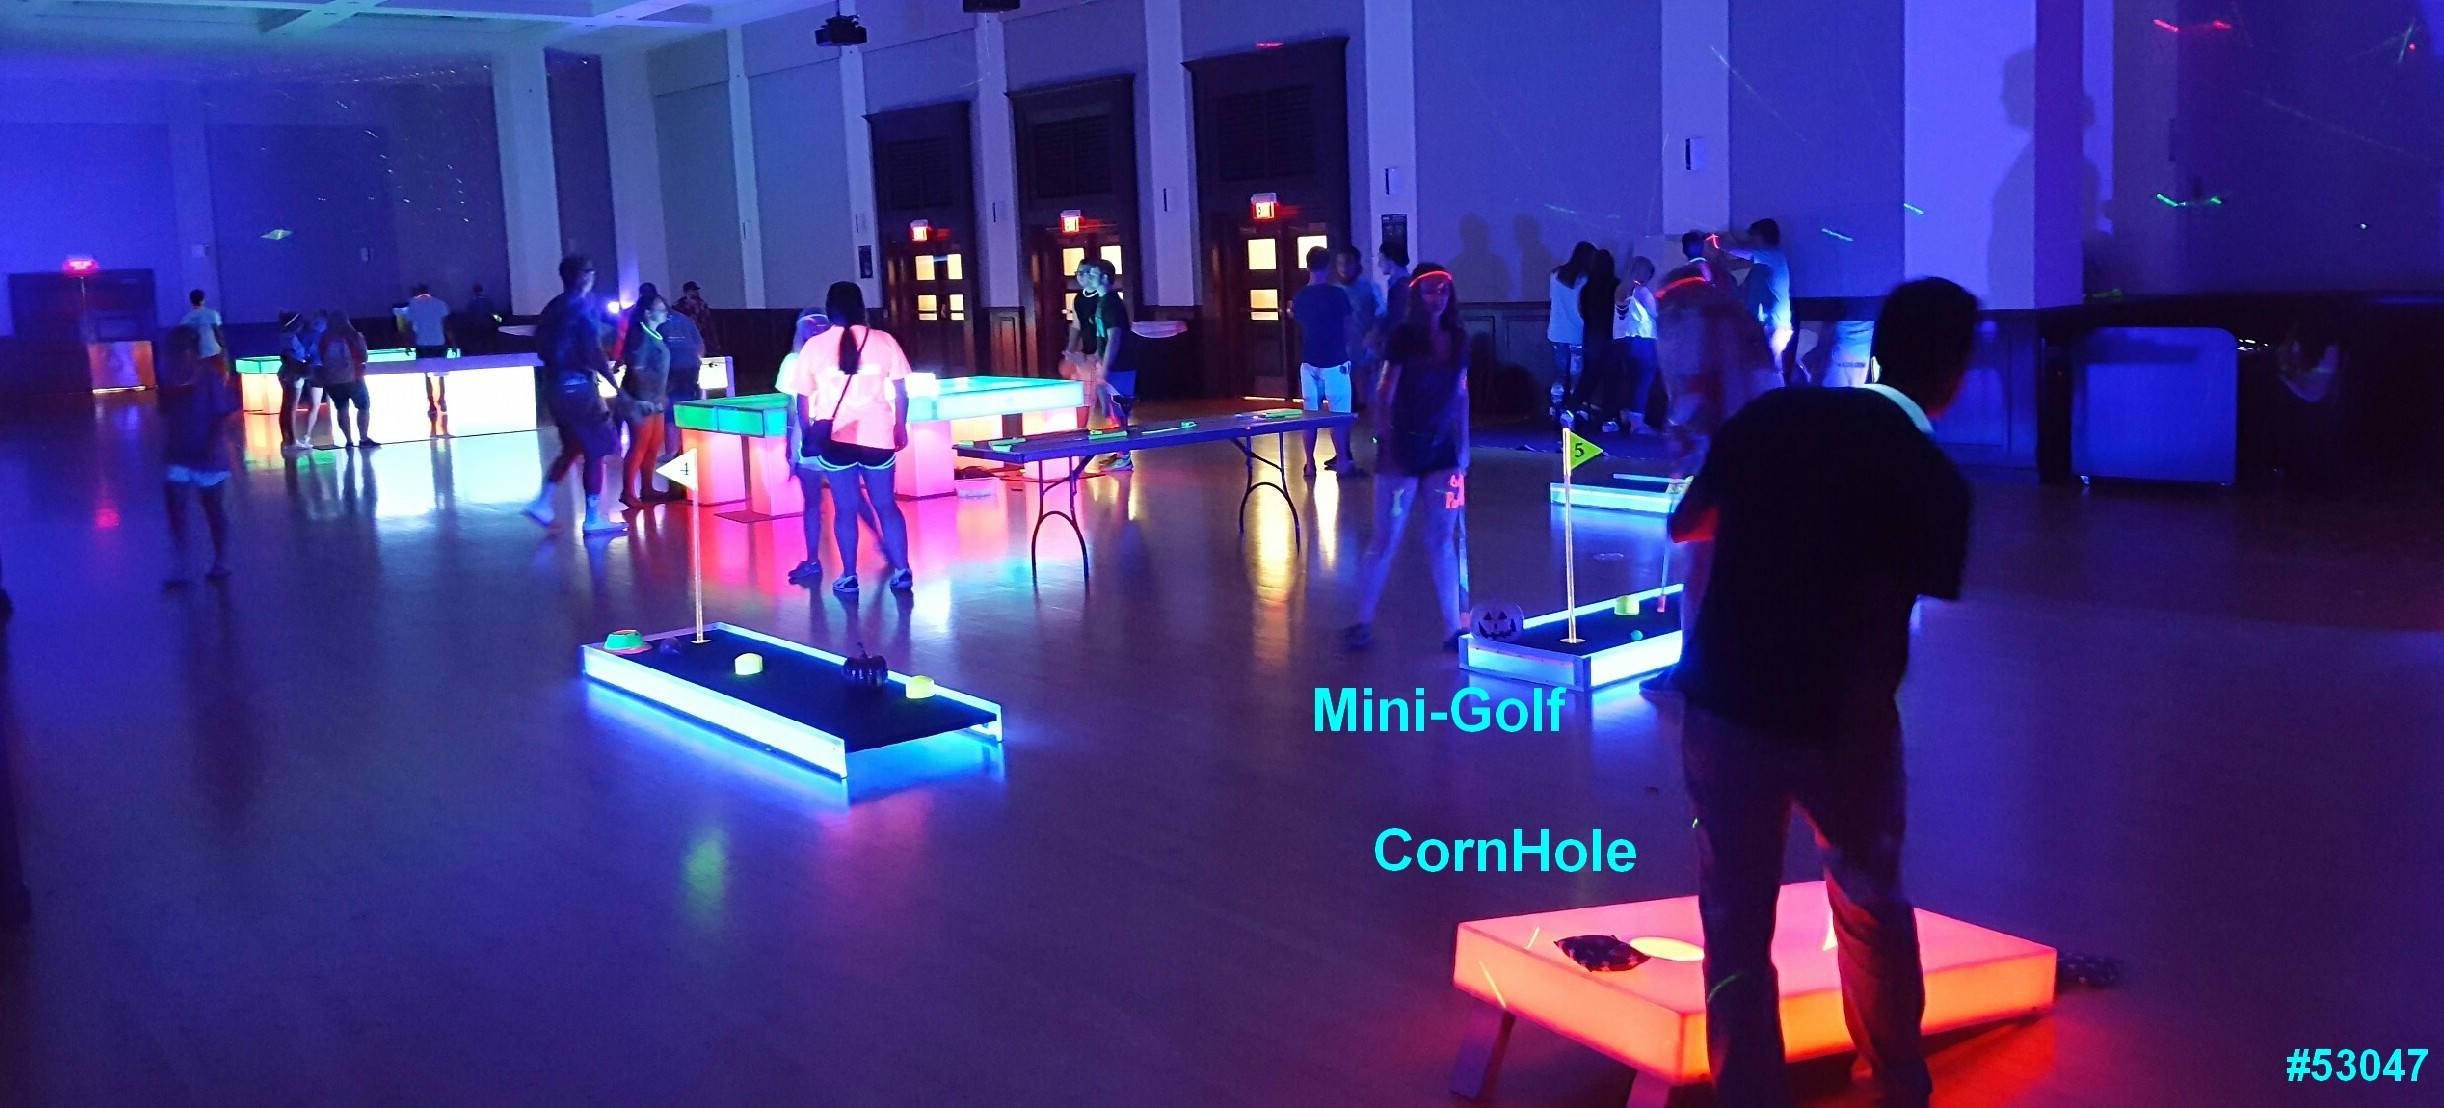 glow games cornhole mini golf glow in the dark rentals 53047